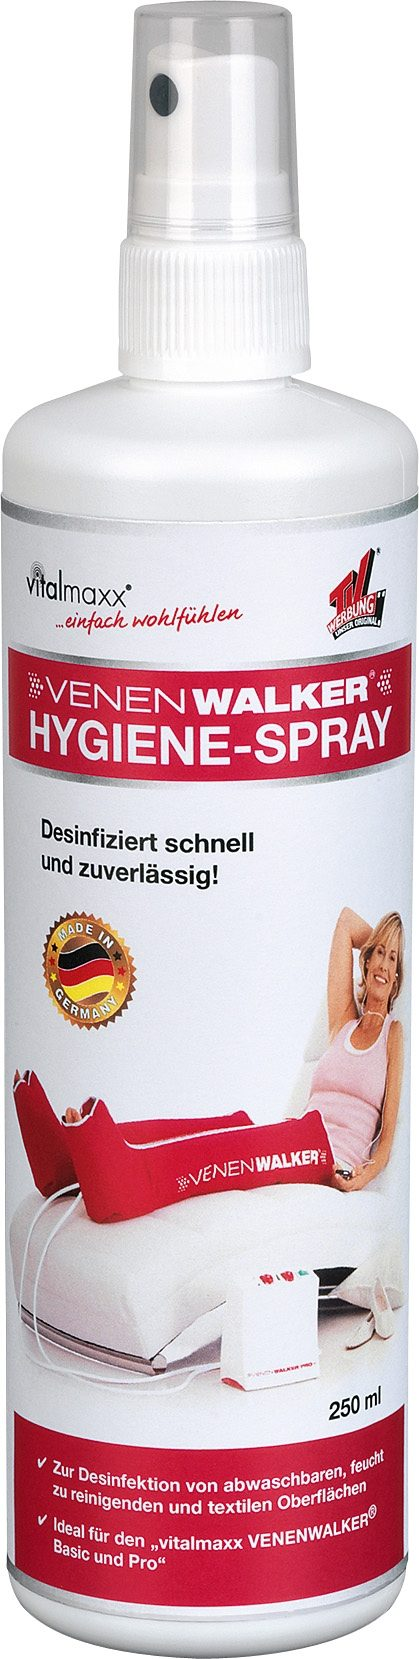 Vitalmaxx Venen Walker Hygiene-Spray 250ml Preisvergleich